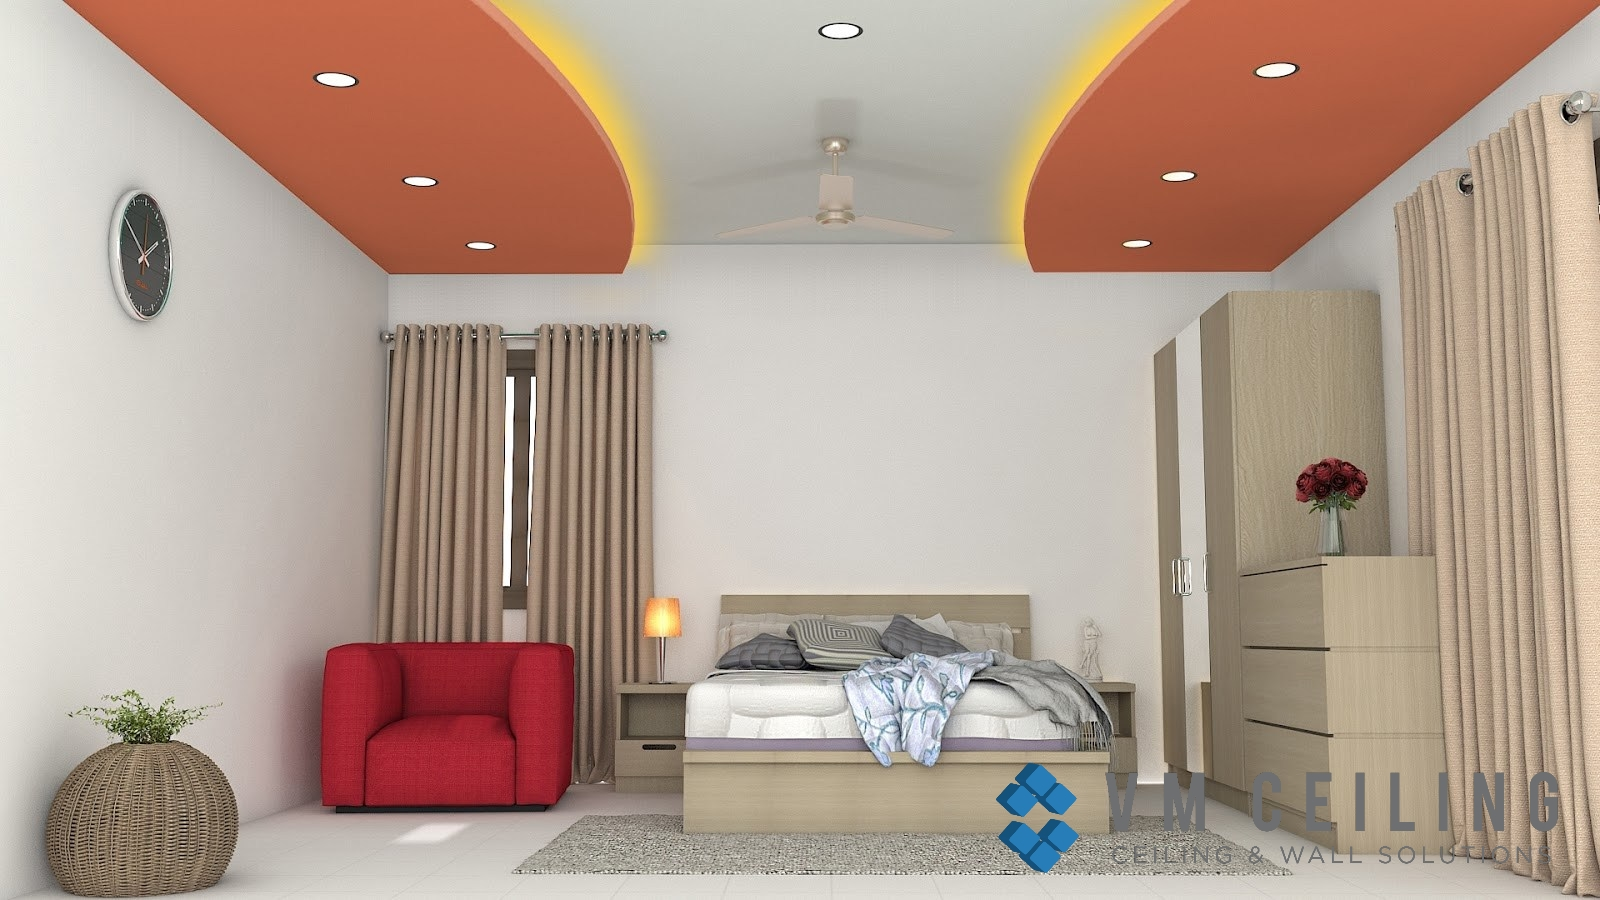 false-ceiling-cost-VM-False-Ceiling-Singapore-Partition-Wall-Contractor_wm